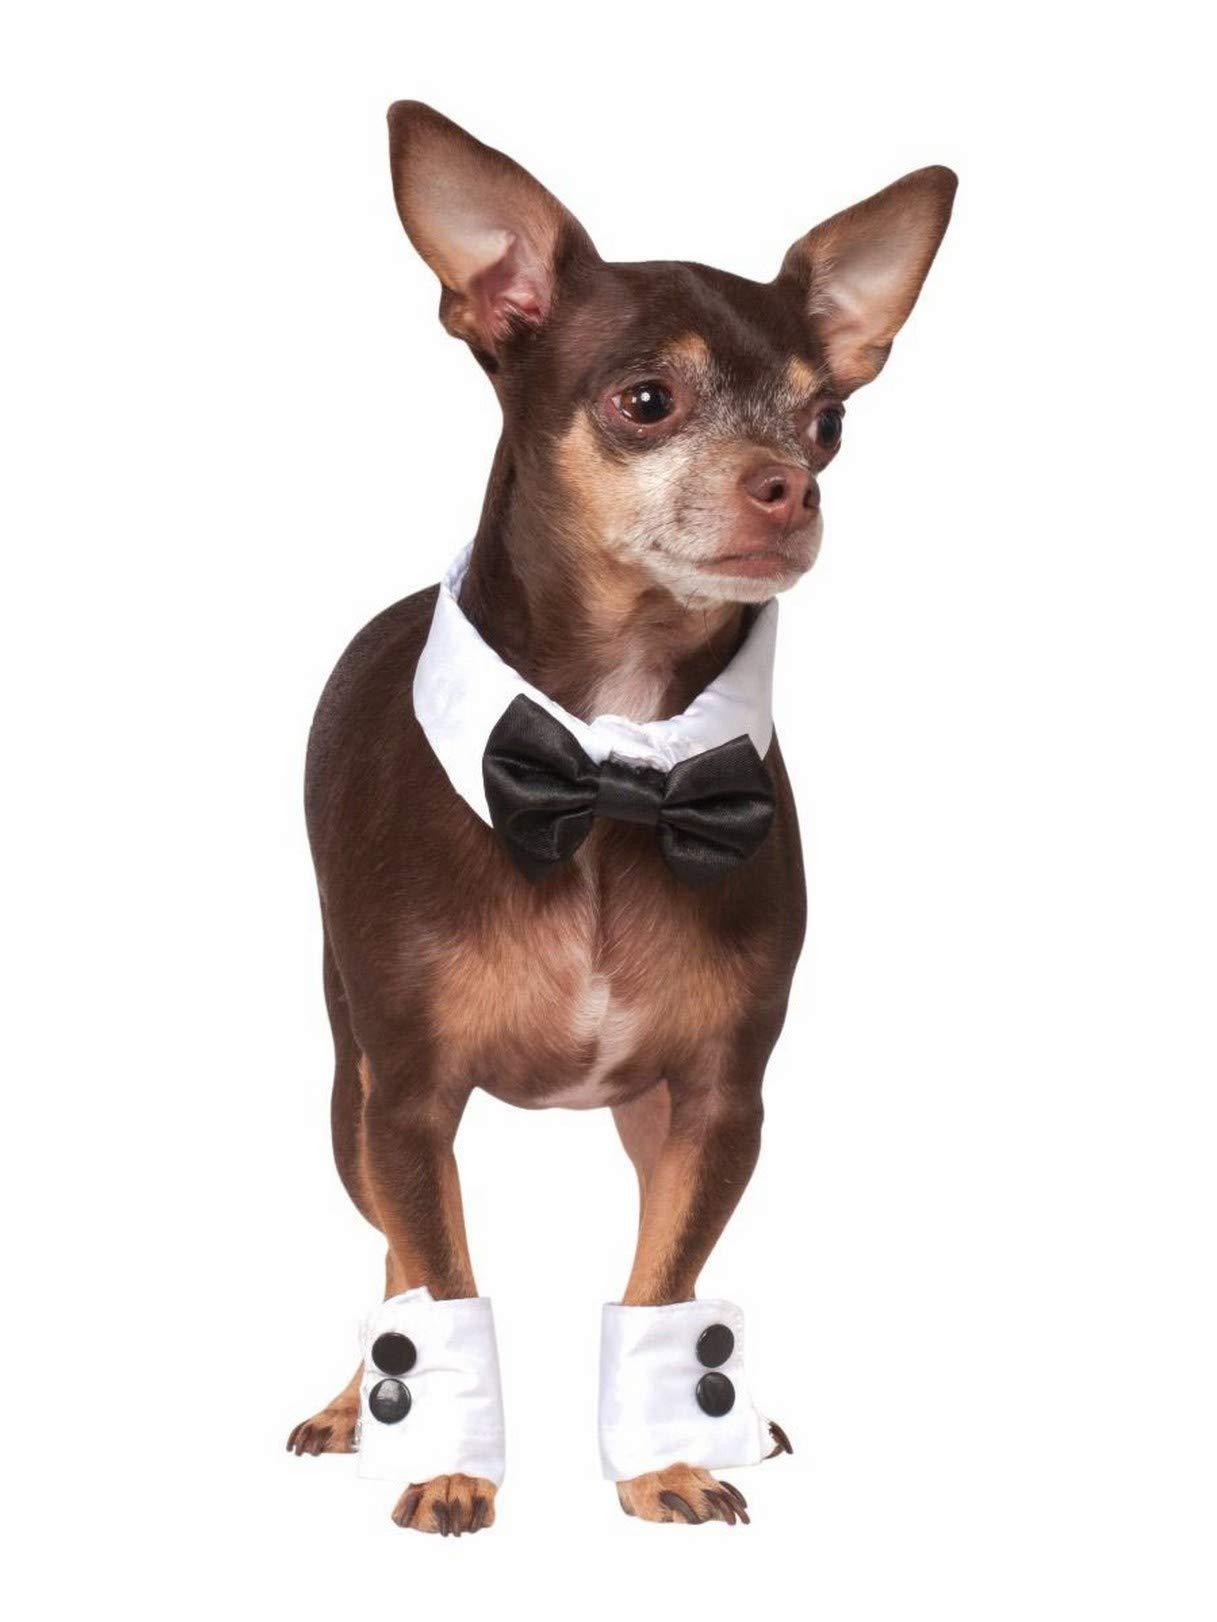 Rubie's Bowtie and Cuff Set Pet Accessories, Medium/Large